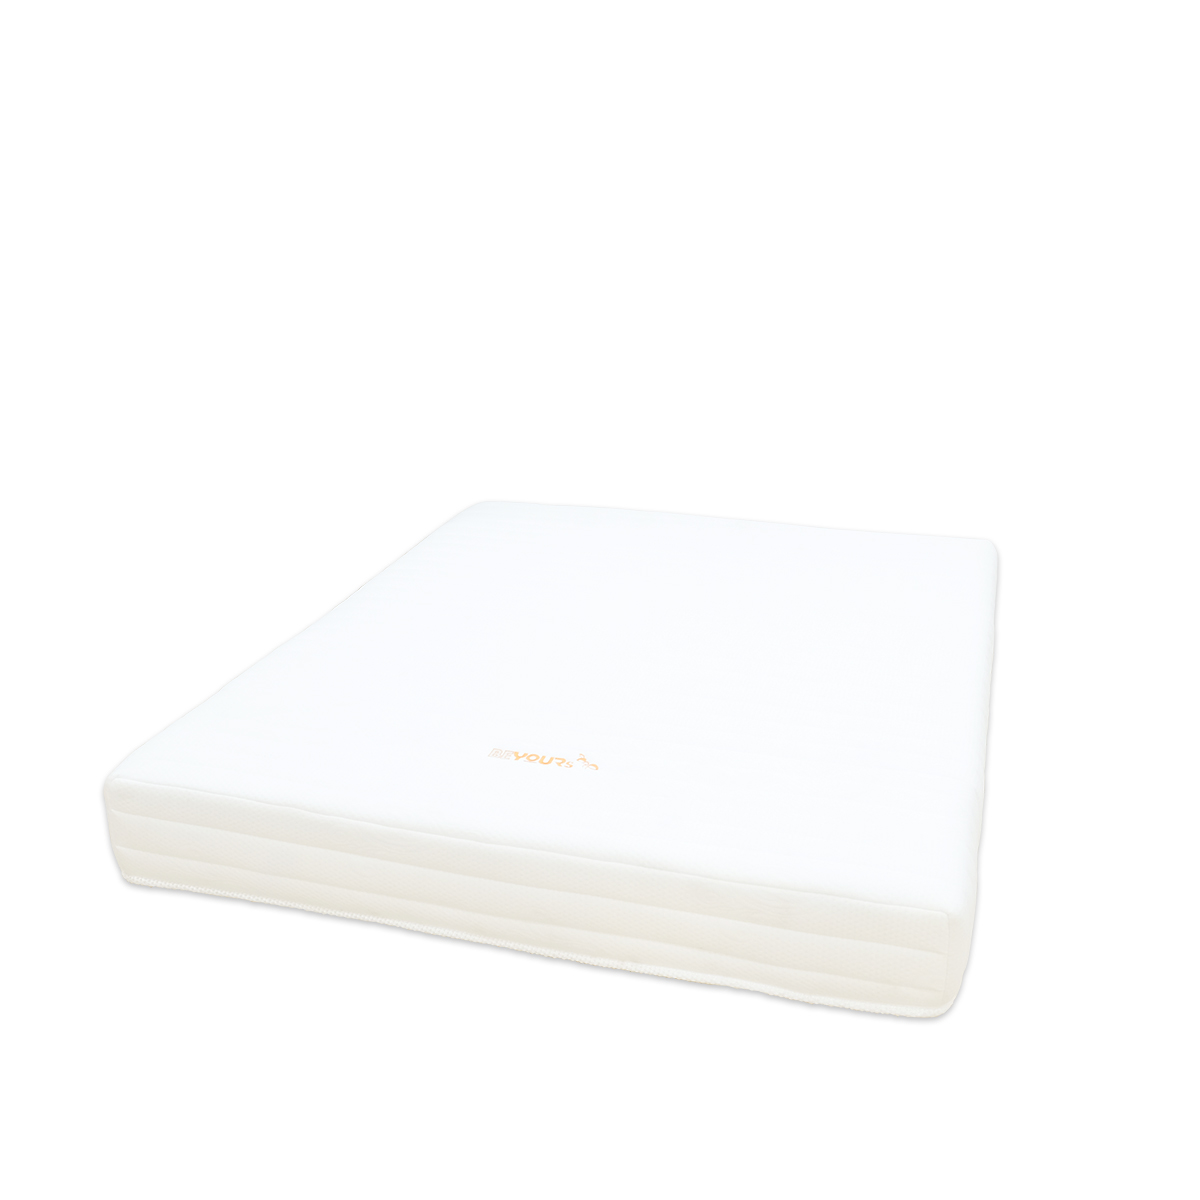 Nệm Beyours Lò Xo Túi 1.6 X 2M White